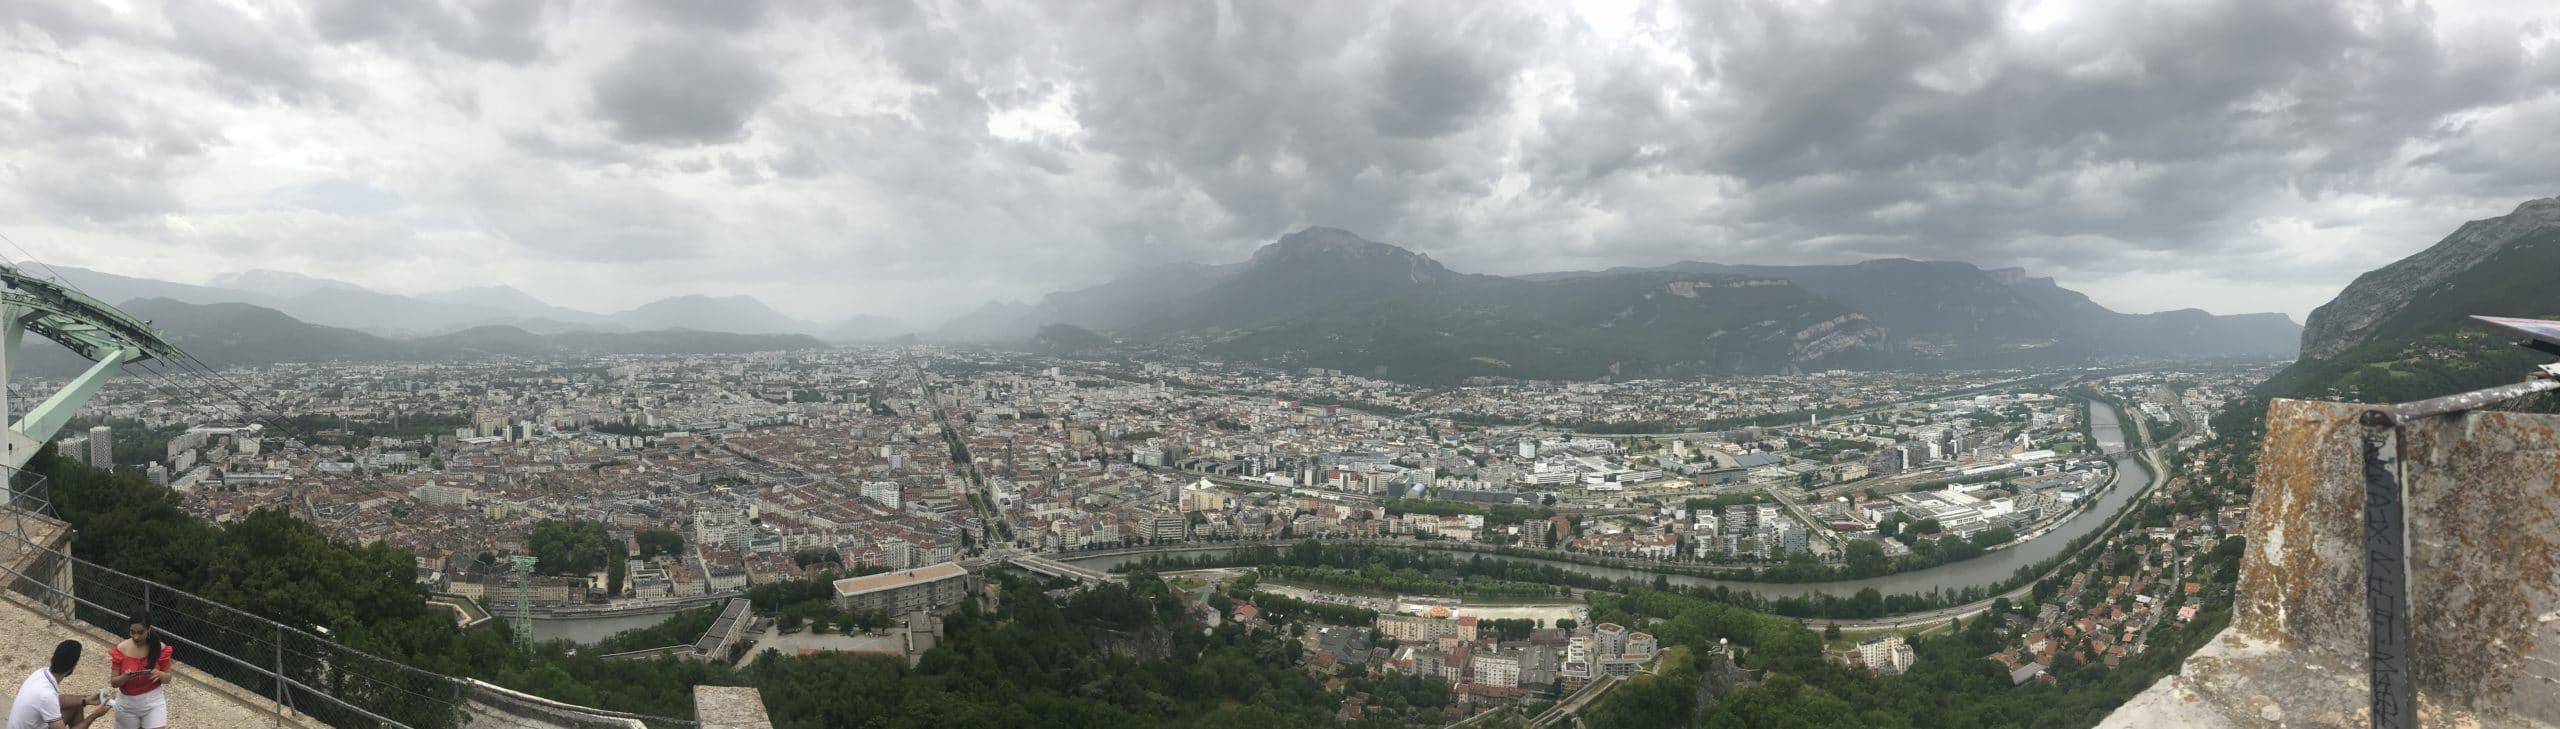 Grenoble Alpes graffiti